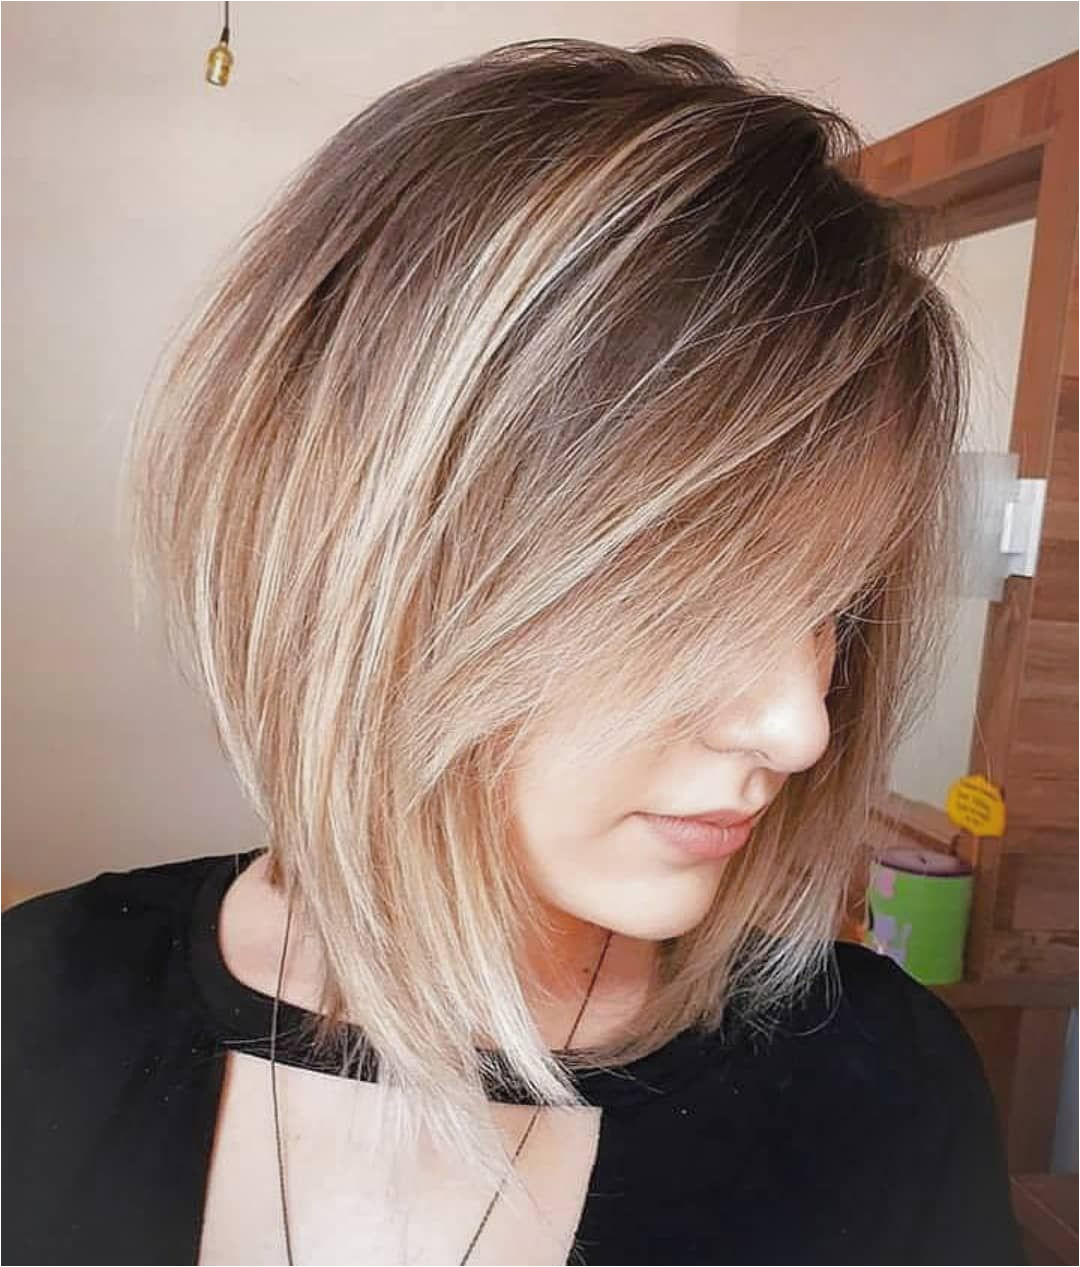 Stylish Choppy Lob Haircut for 2019 Women Shoulder Length Hairstyle Ideas